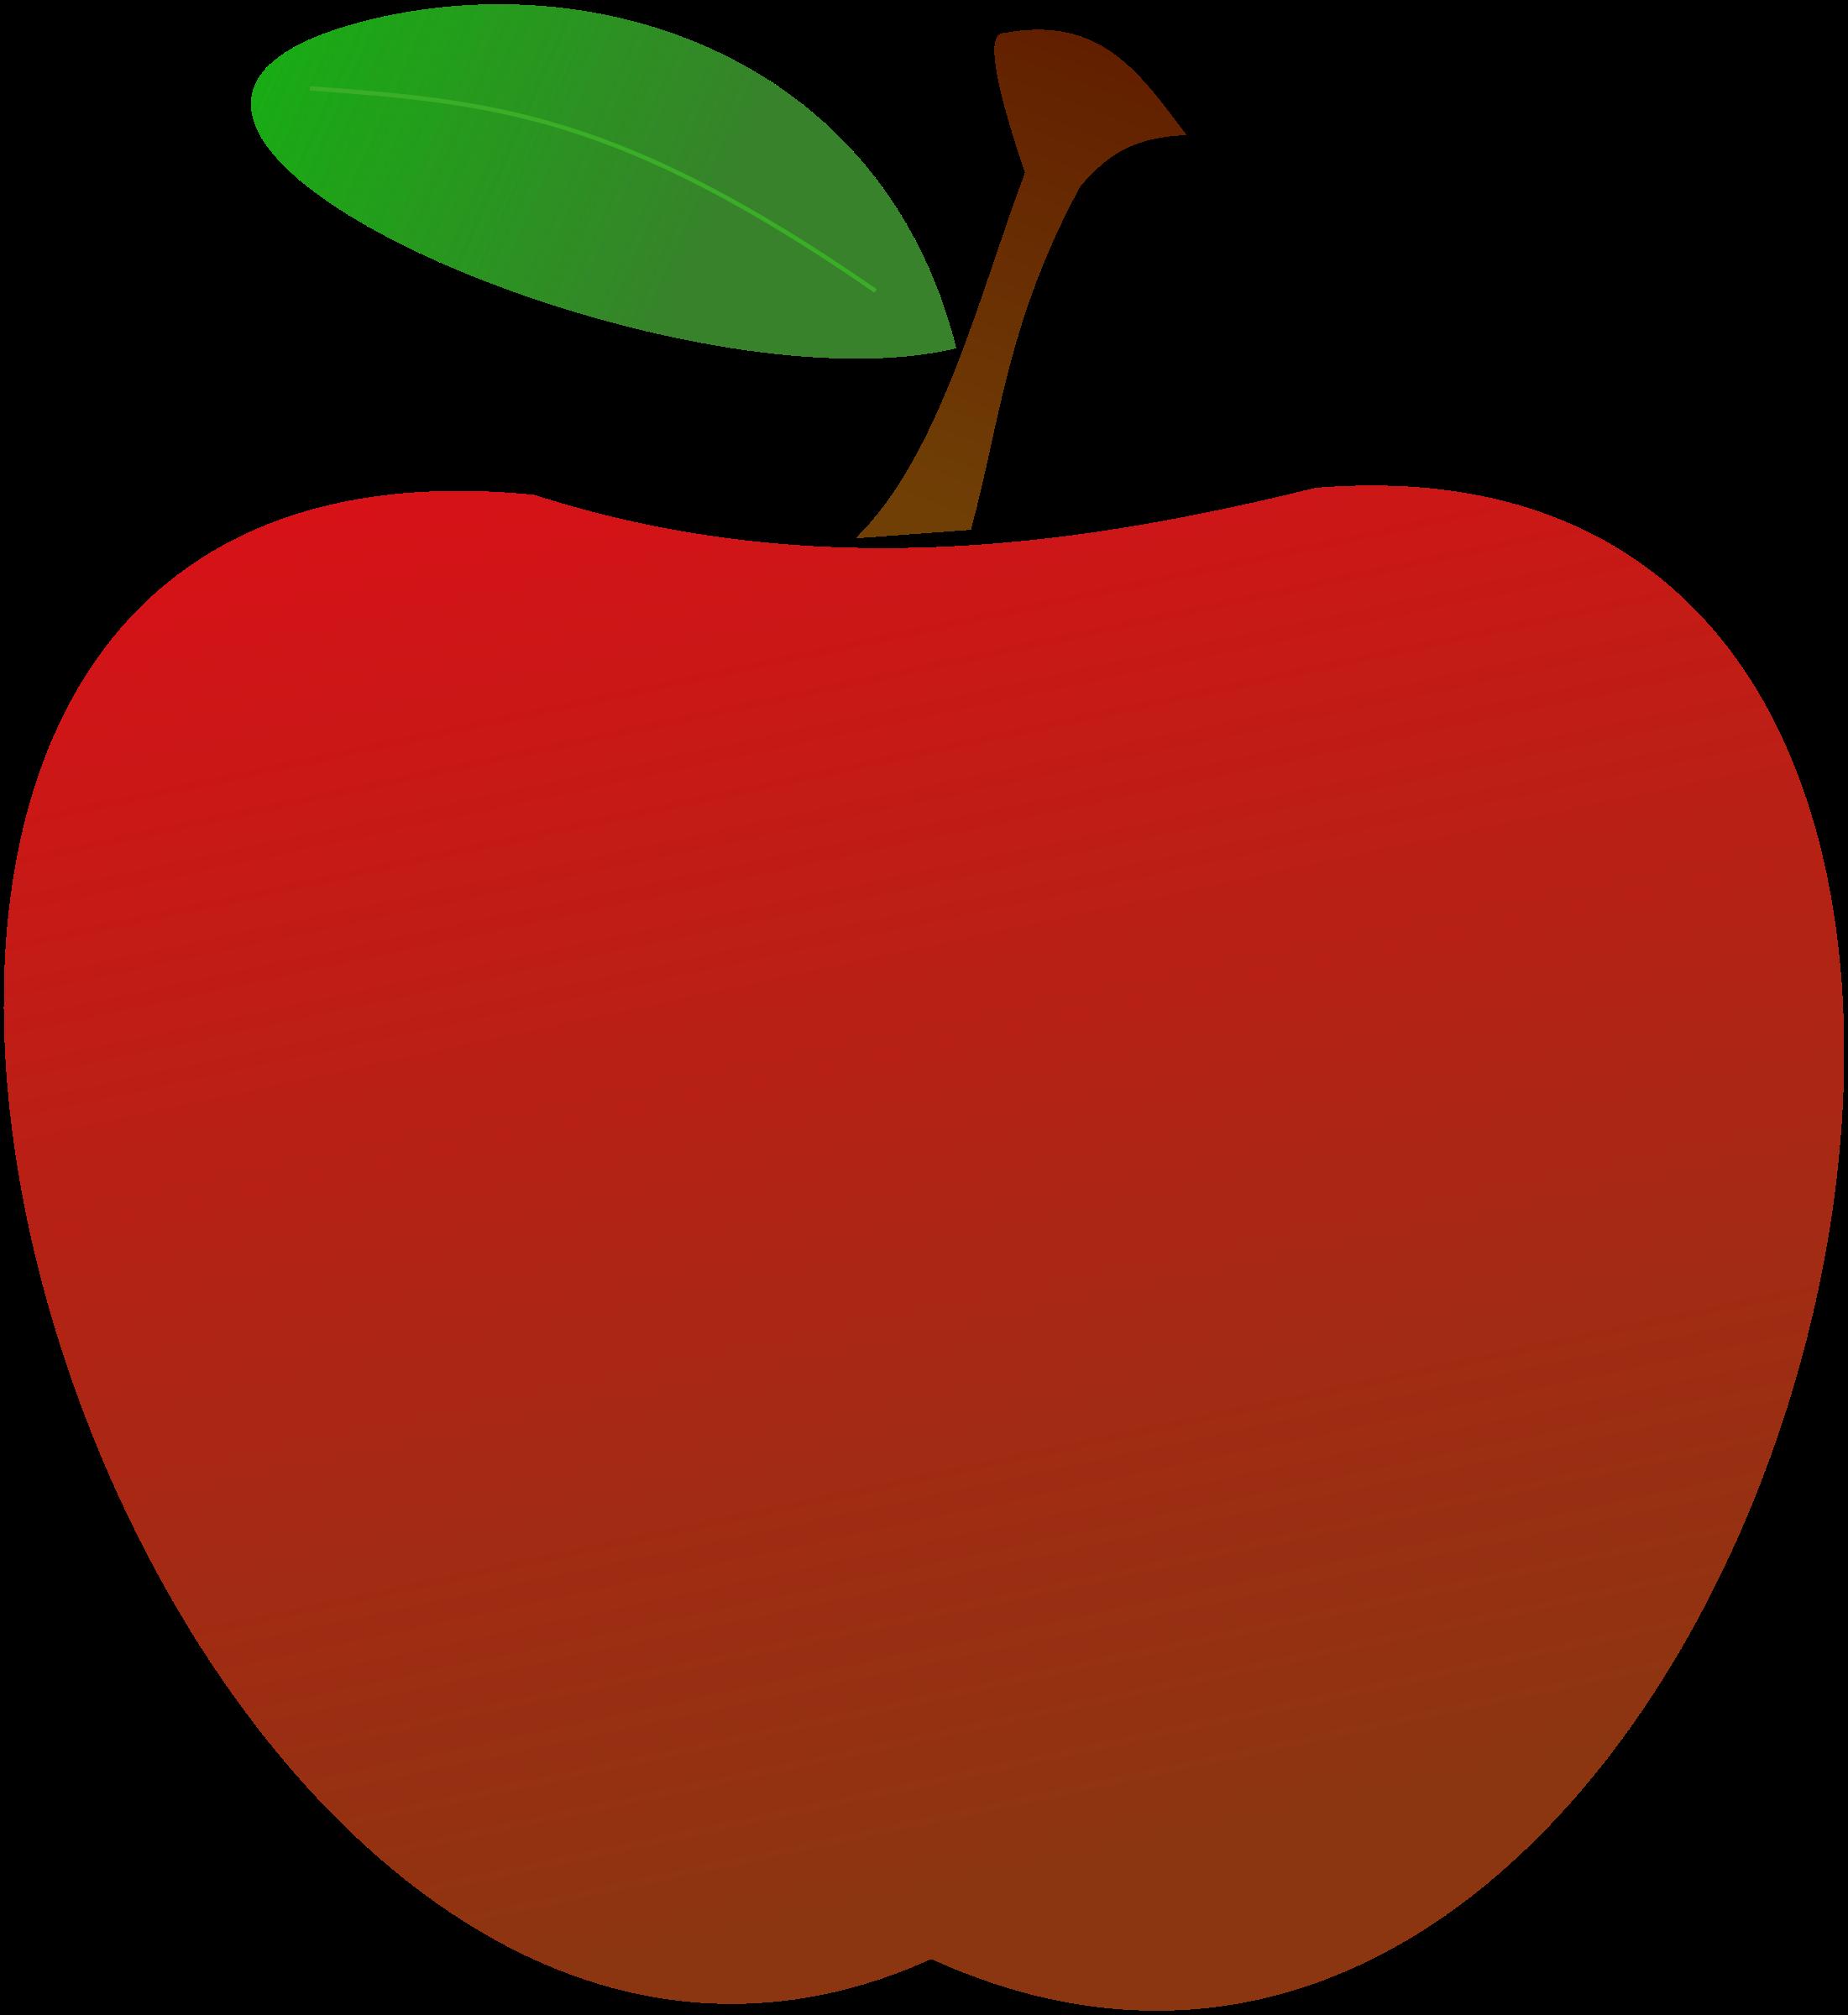 teacher apple clipart-teacher apple clipart-10